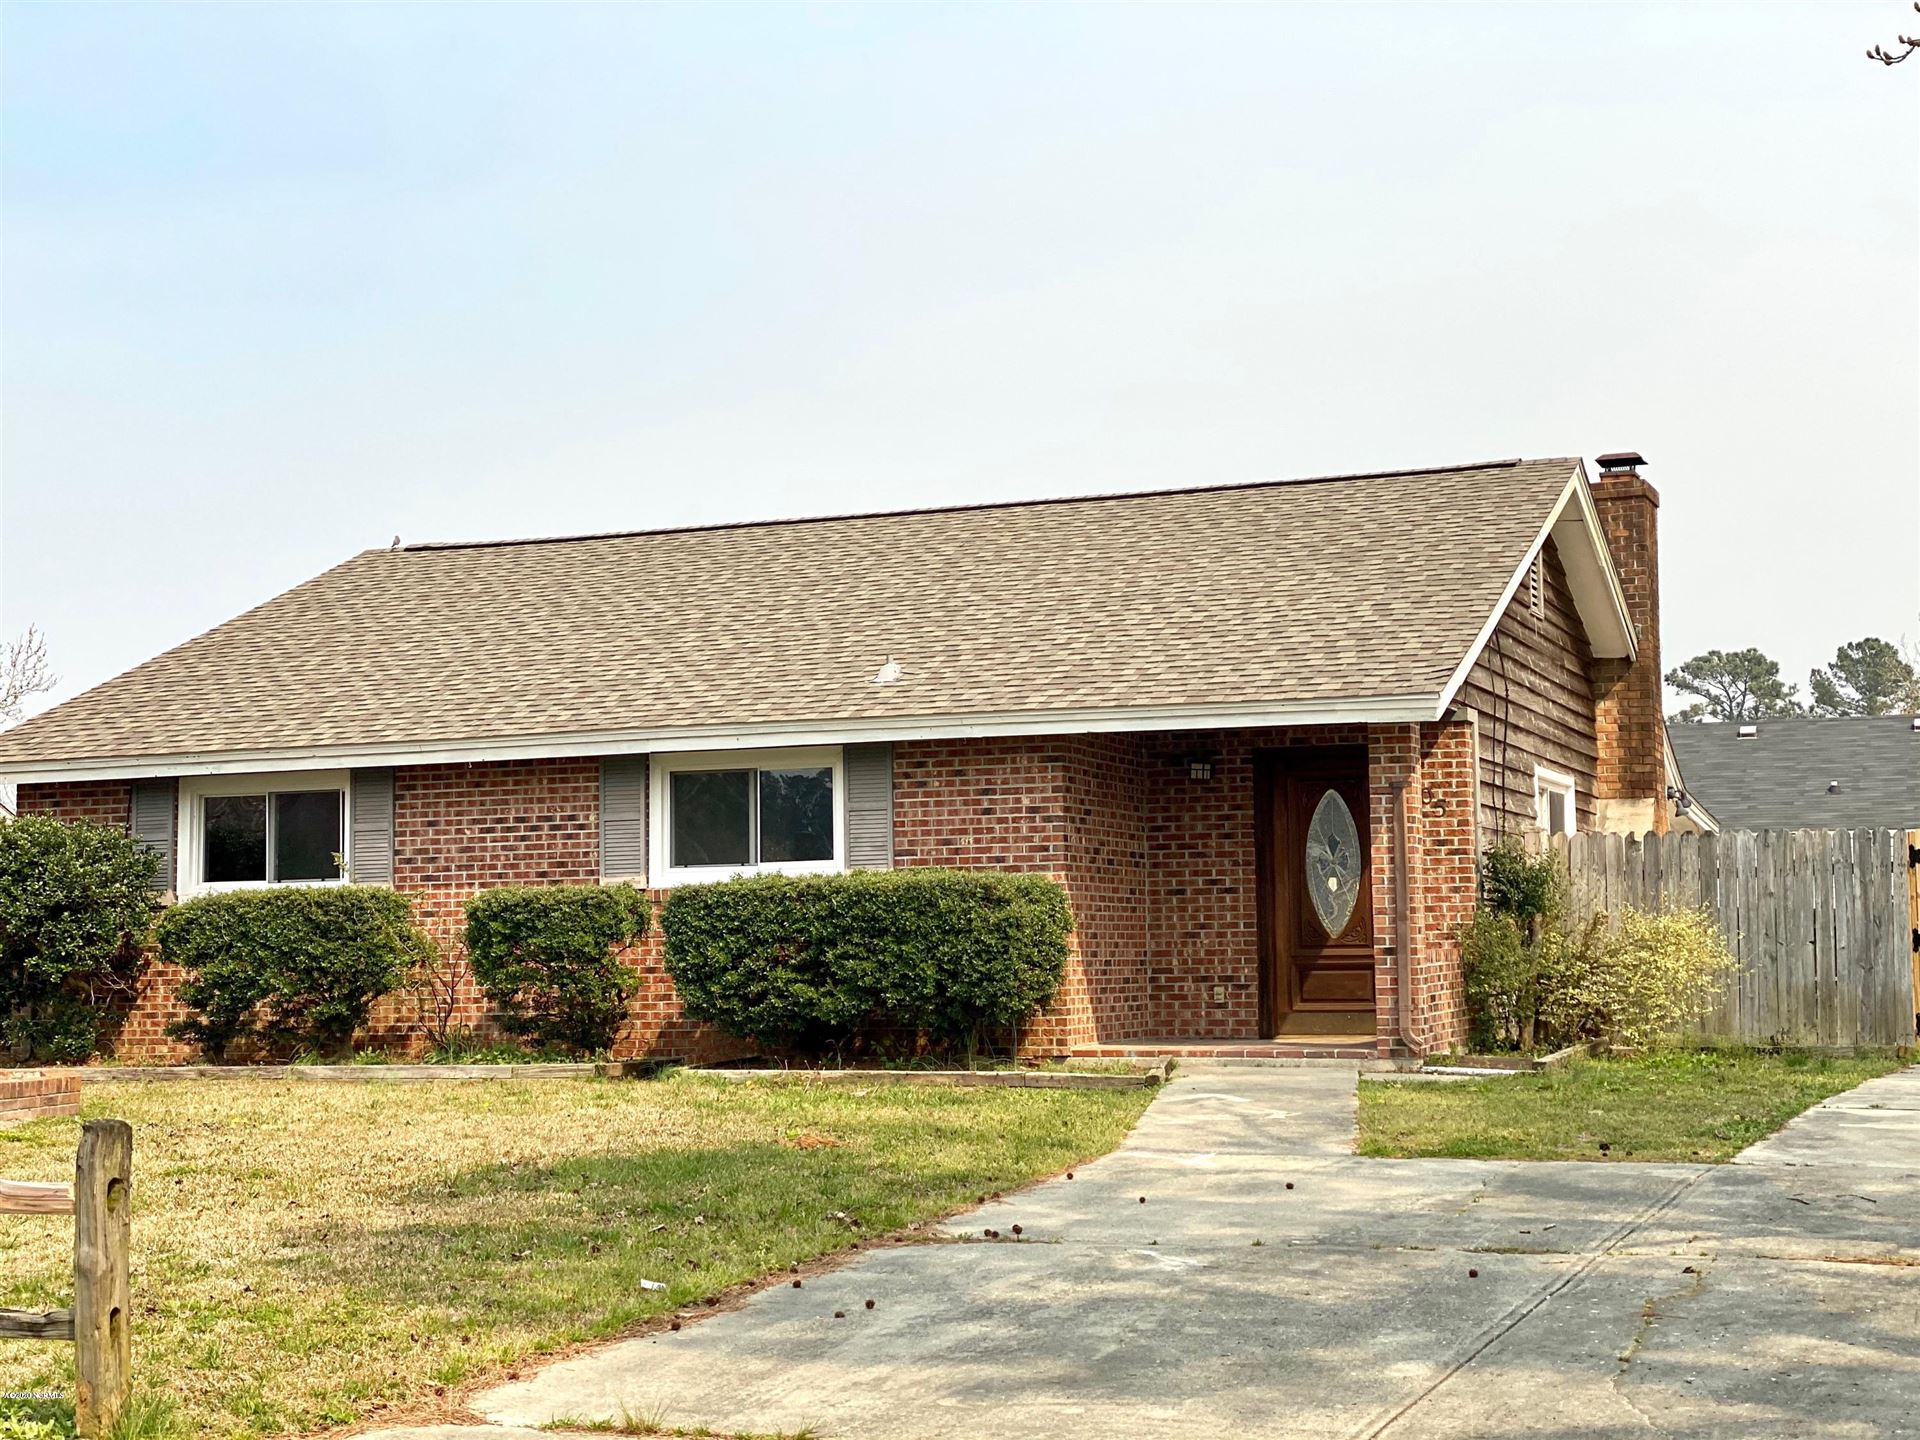 505 S Pine Cone Lane, Jacksonville, NC 28546 - #: 100210863